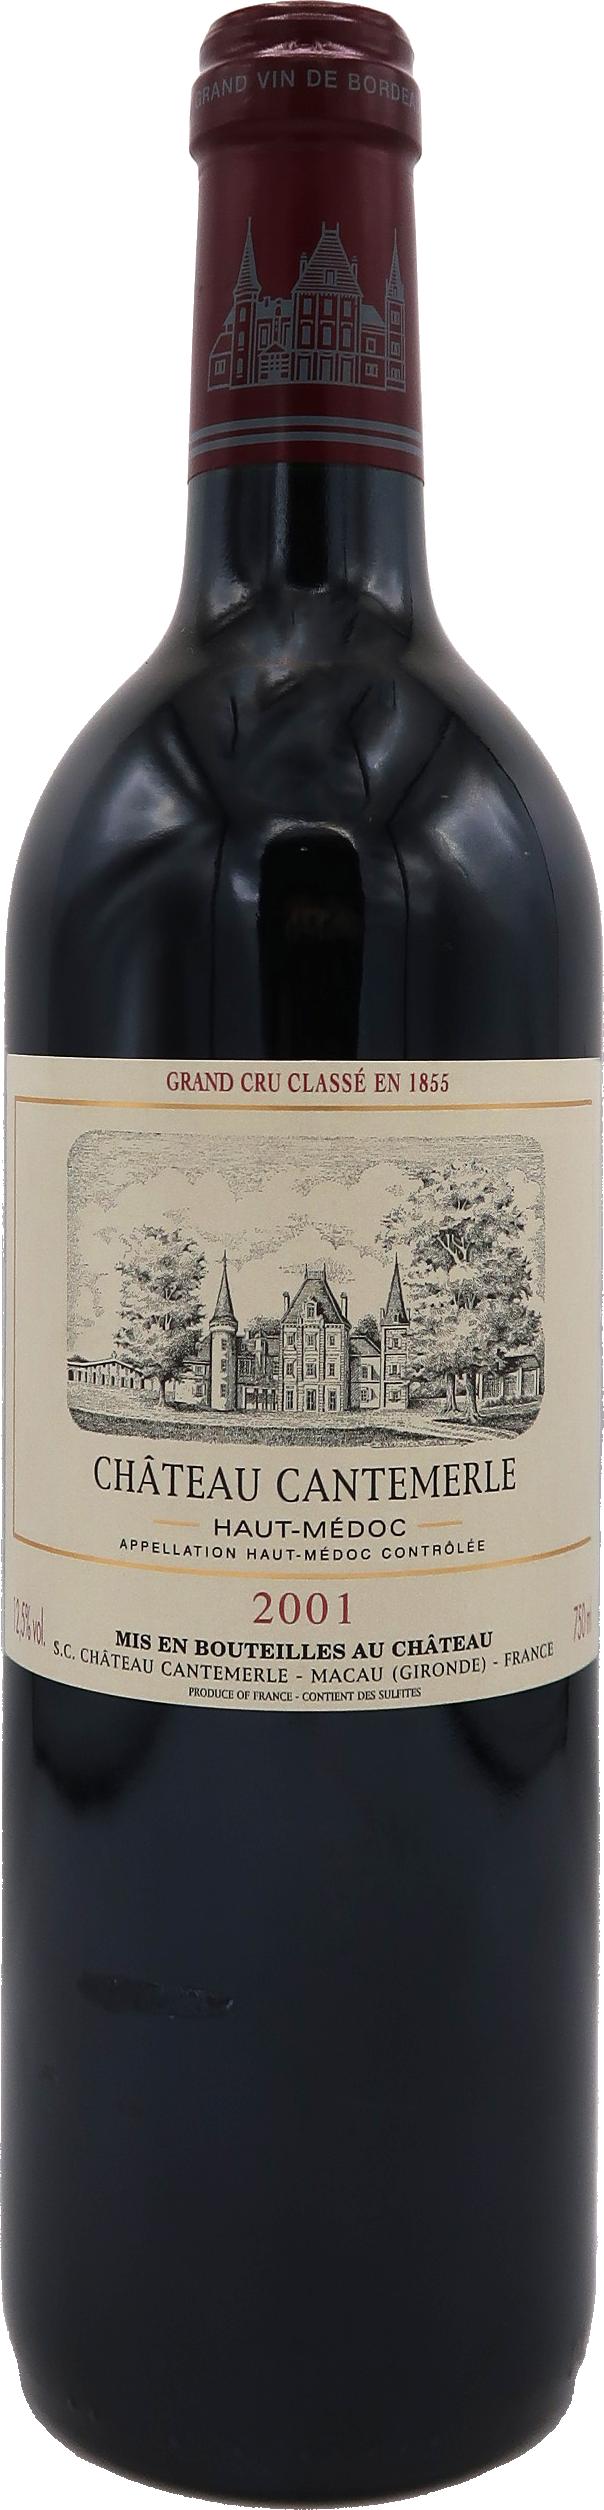 Château Cantemerle 2001